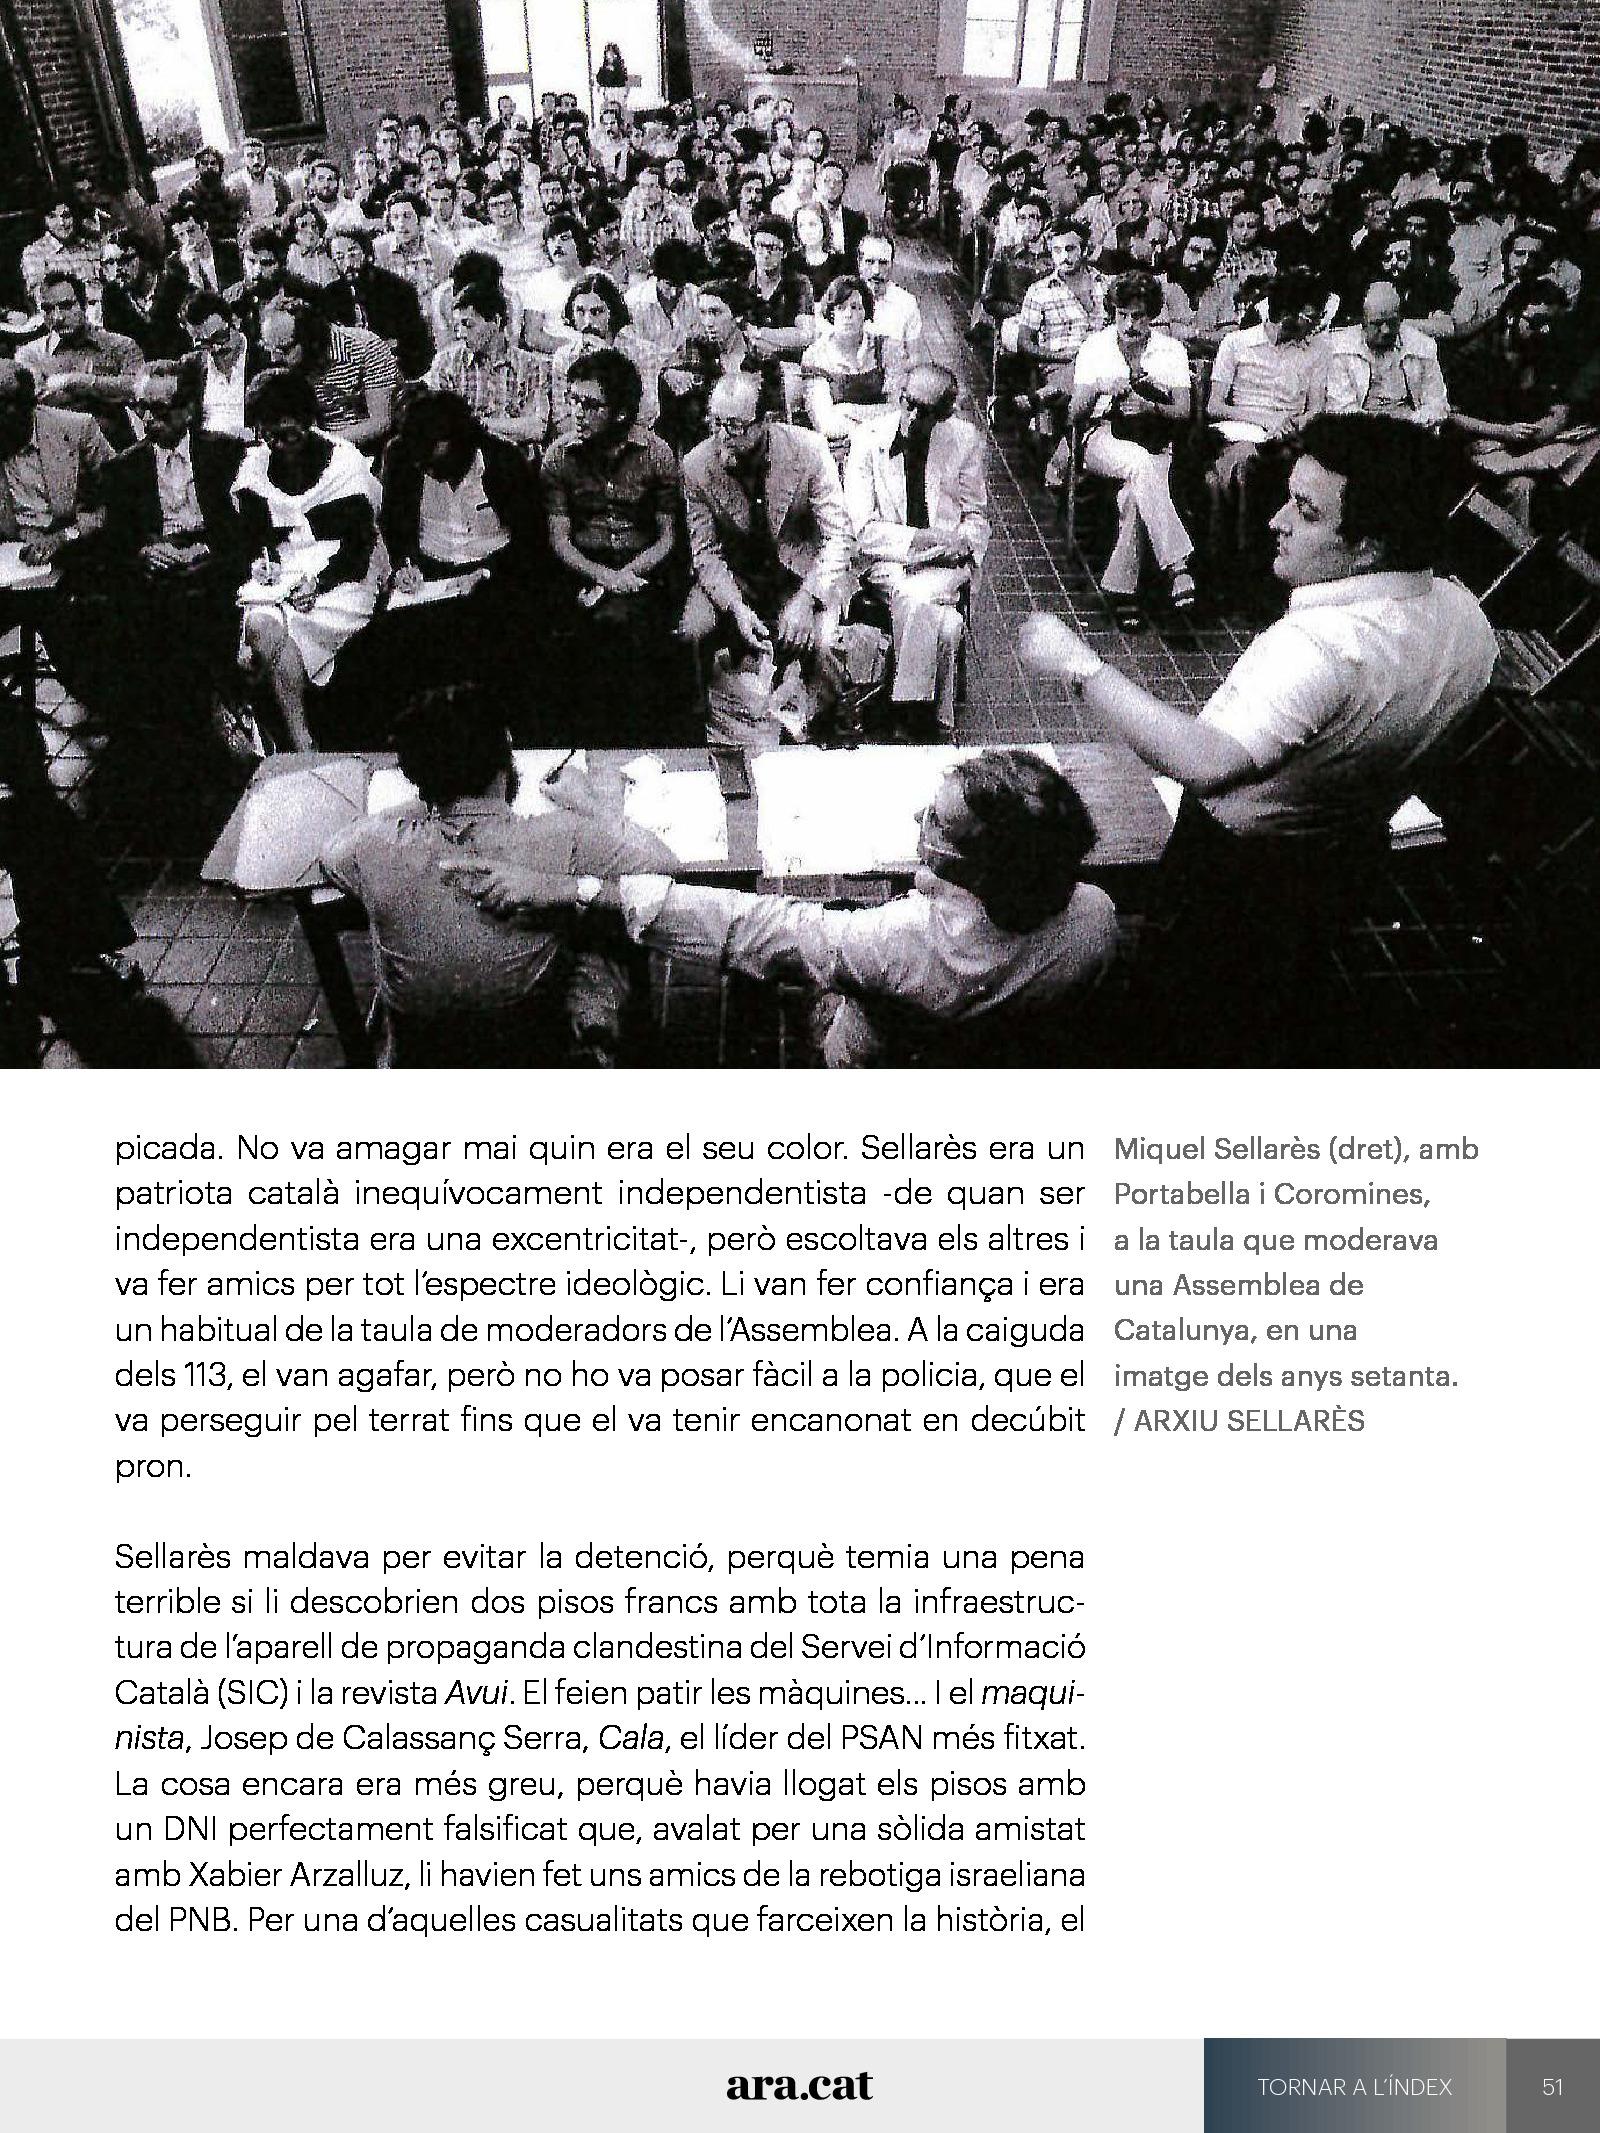 Memòria de la resistència antifranquista 3